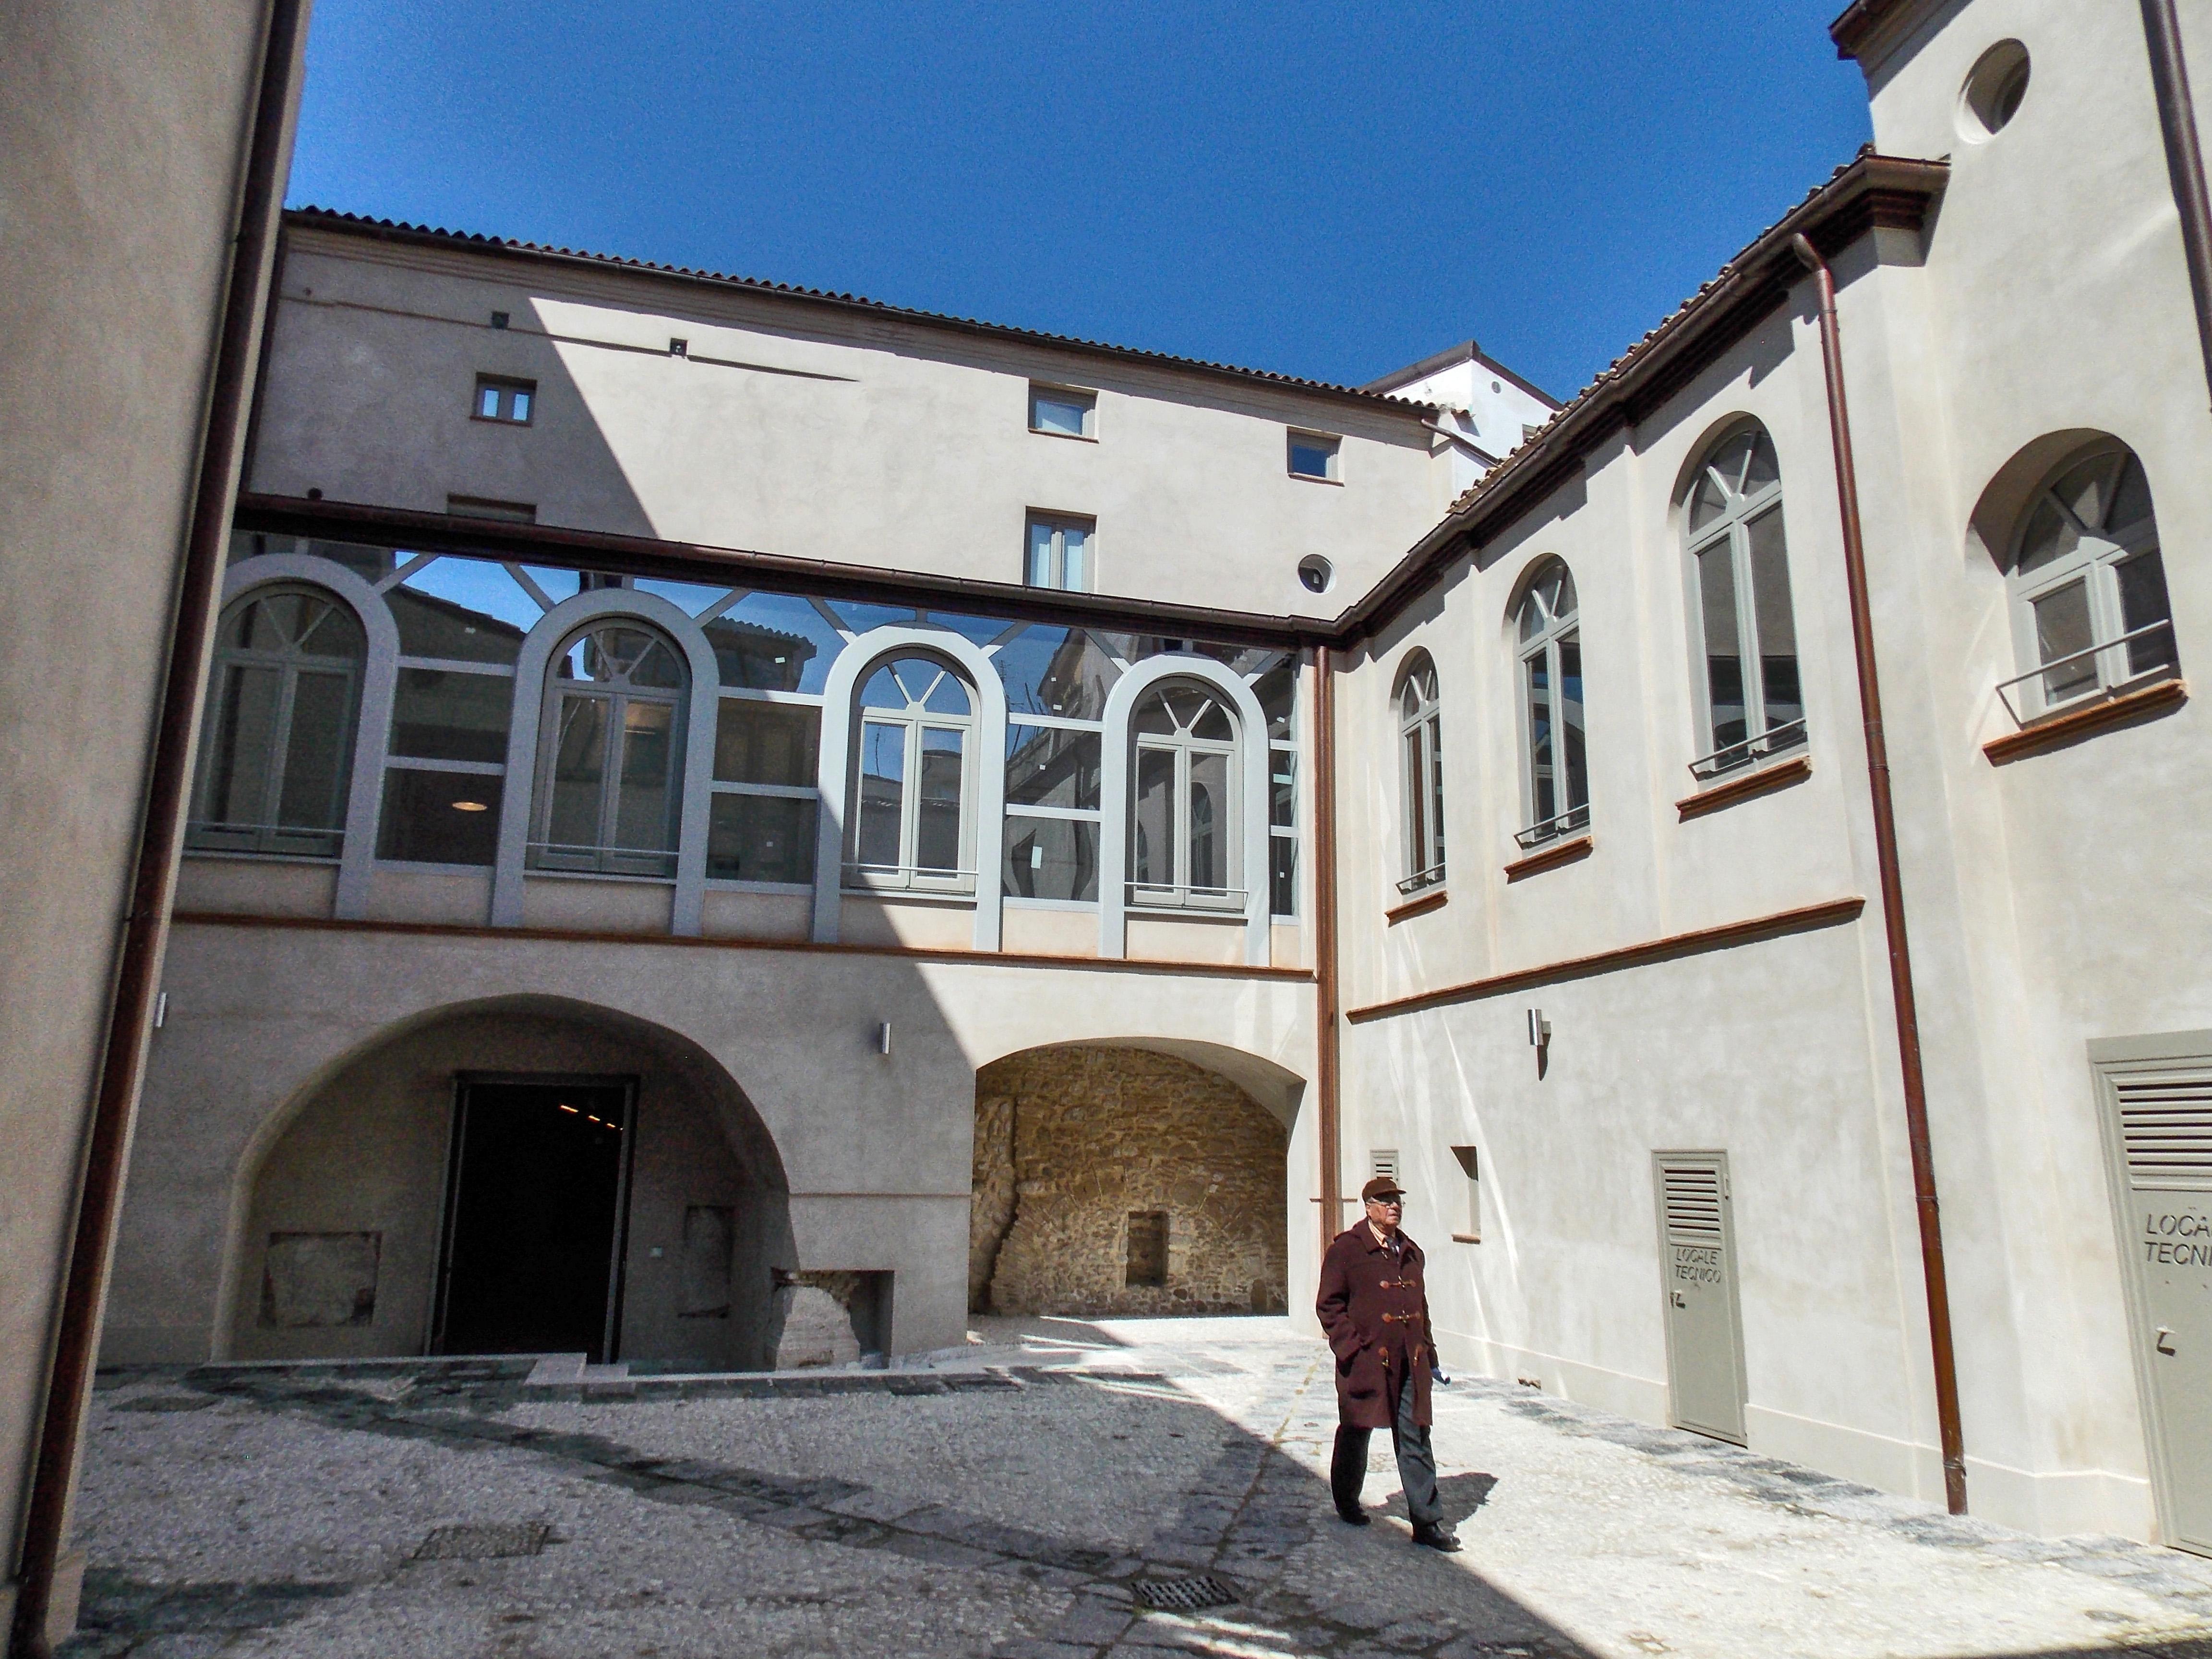 File:San Vittorino (Benevento) 07.jpg - Wikimedia Commons